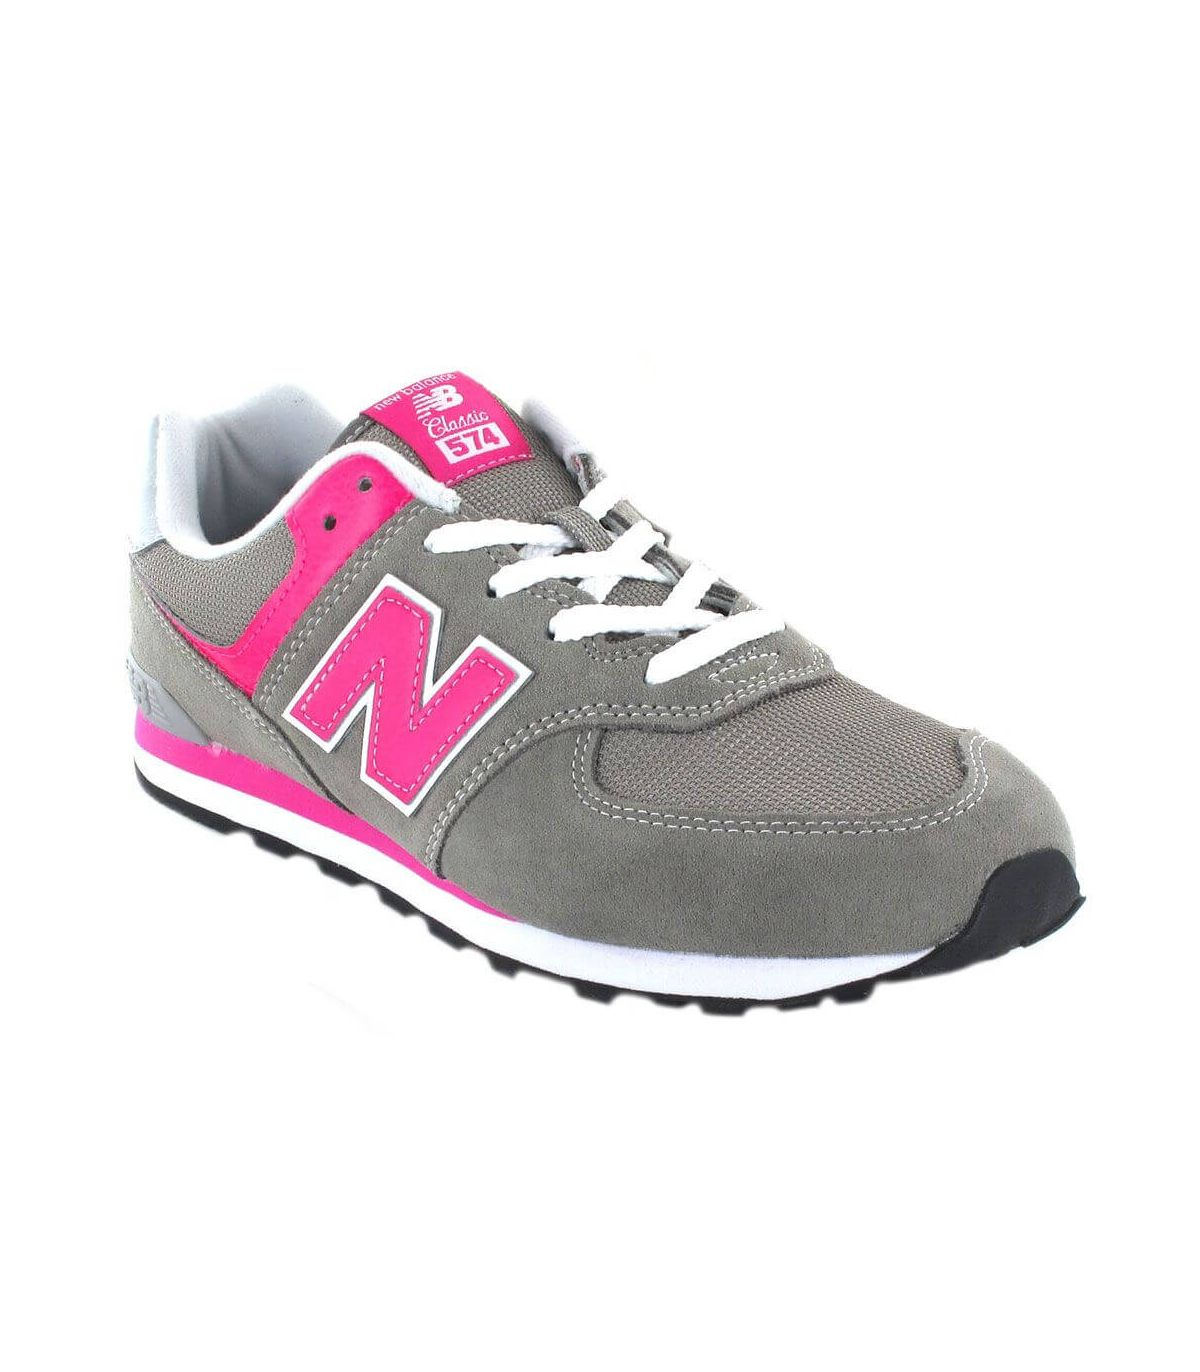 New Balance GC574GP New Balance Calzado Casual Junior Lifestyle Tallas: 36, 37, 40, 38; Color: gris